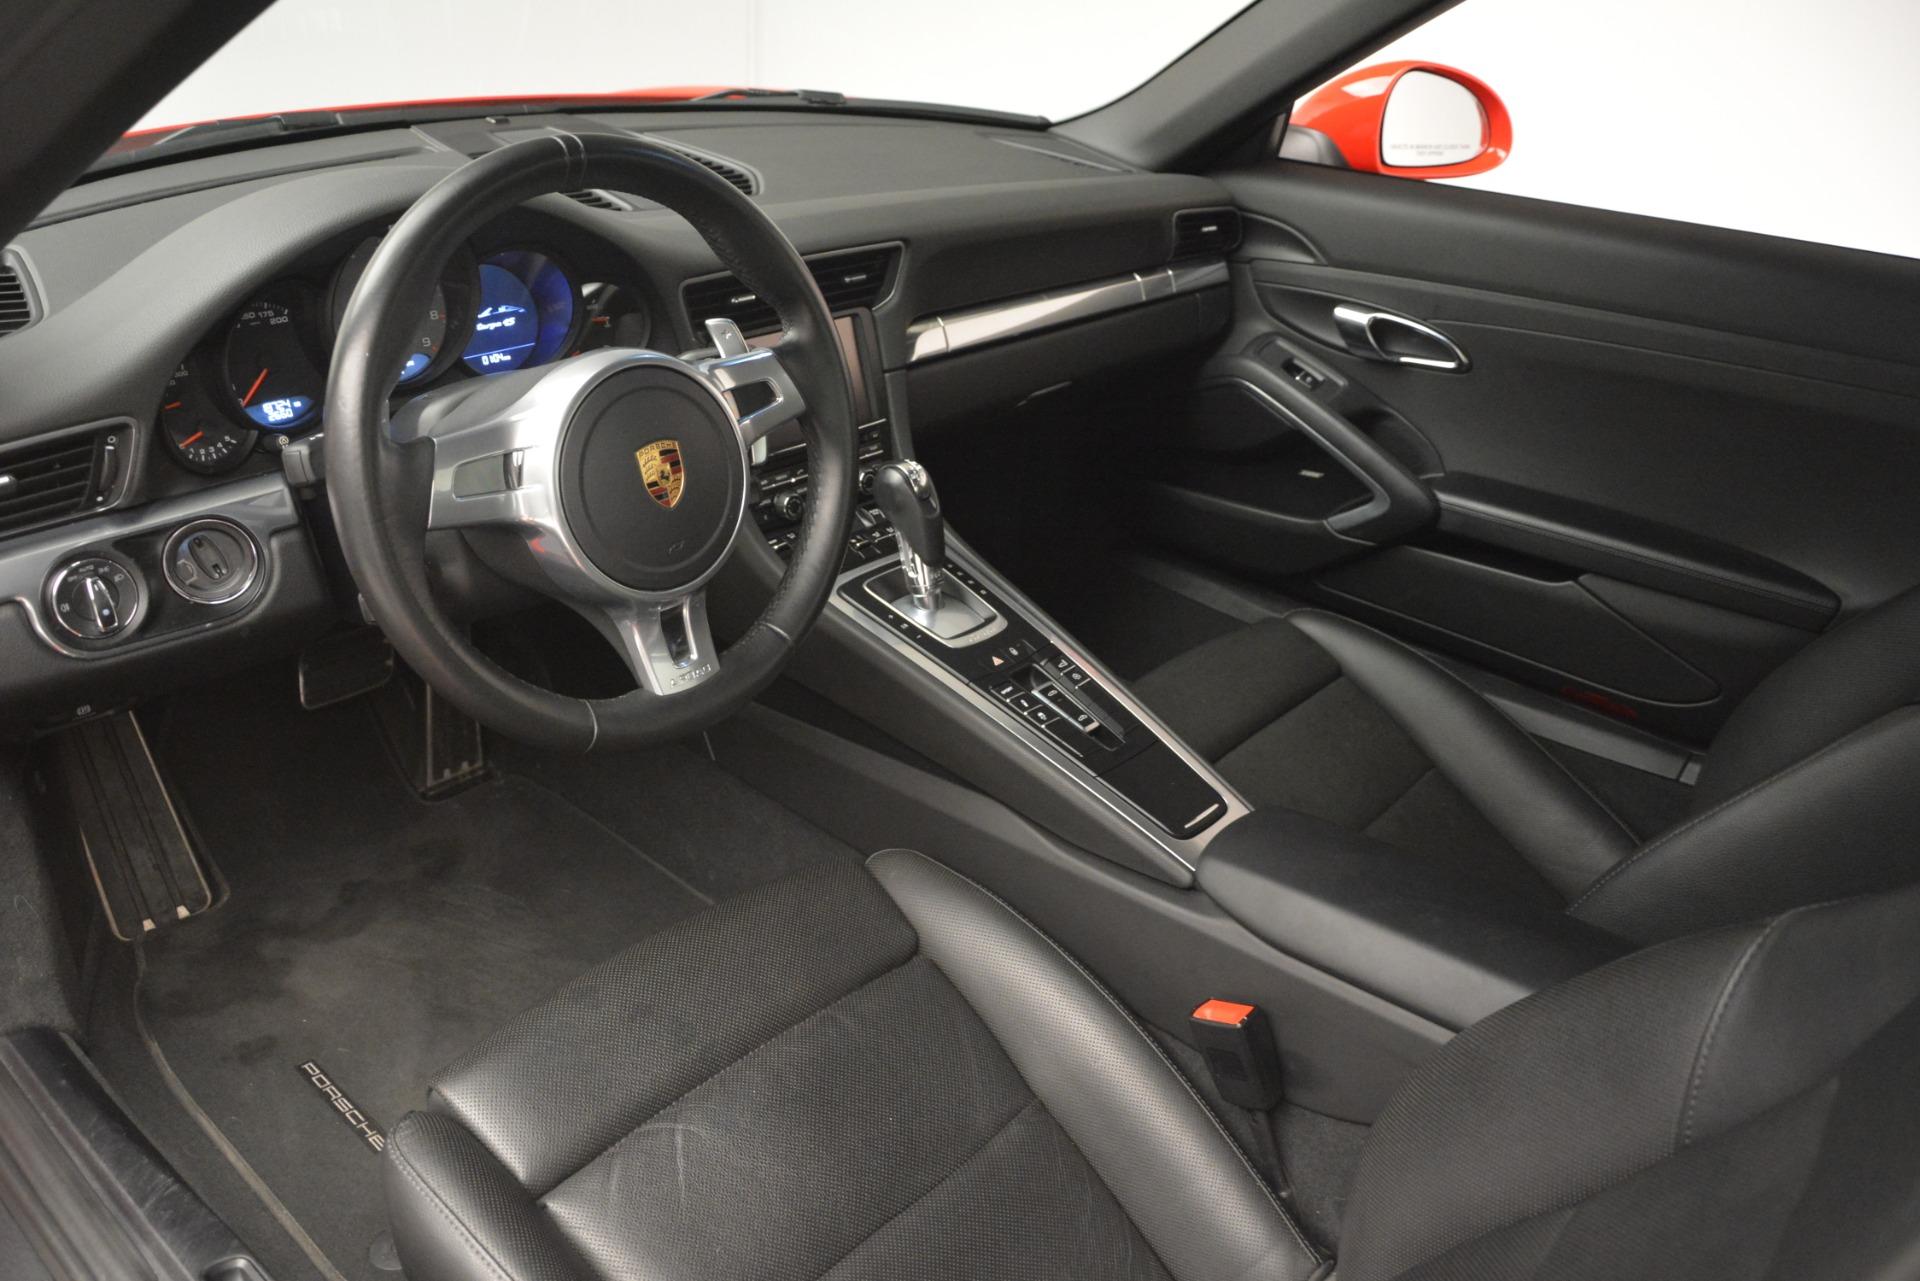 Used 2016 Porsche 911 Targa 4S For Sale 0 In Greenwich, CT